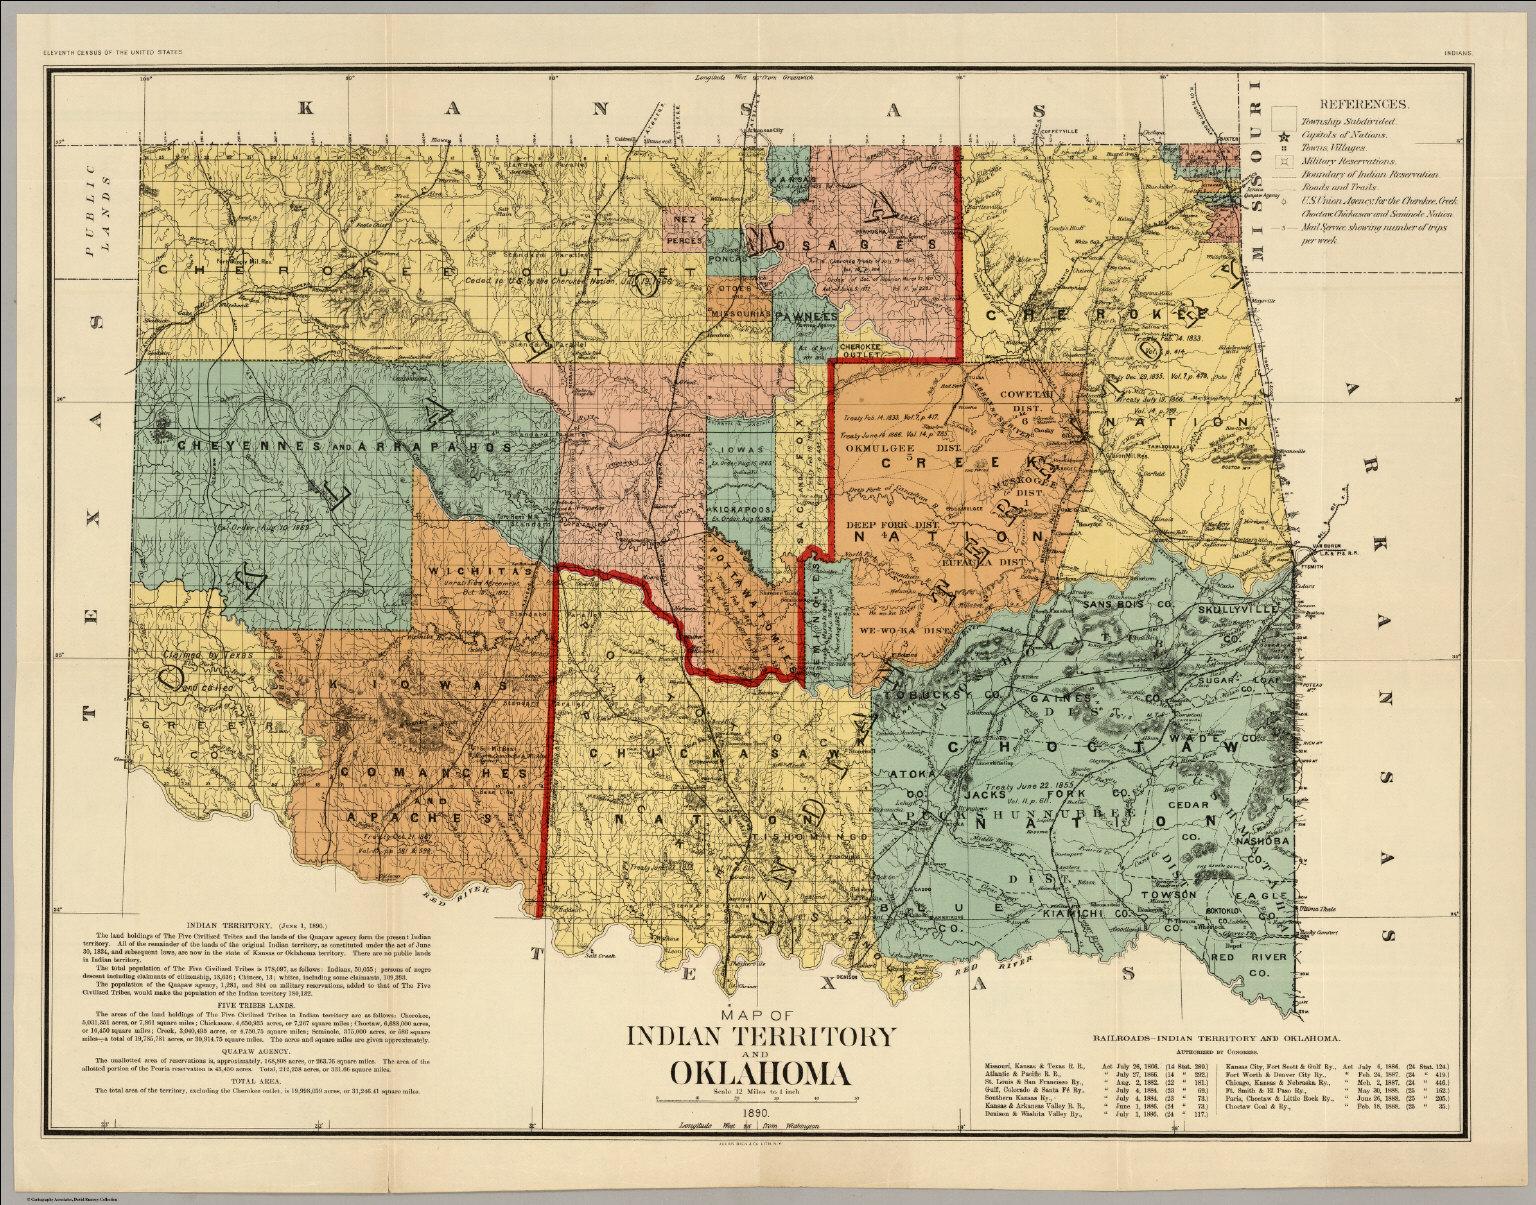 oklahoma indian territory1890 3